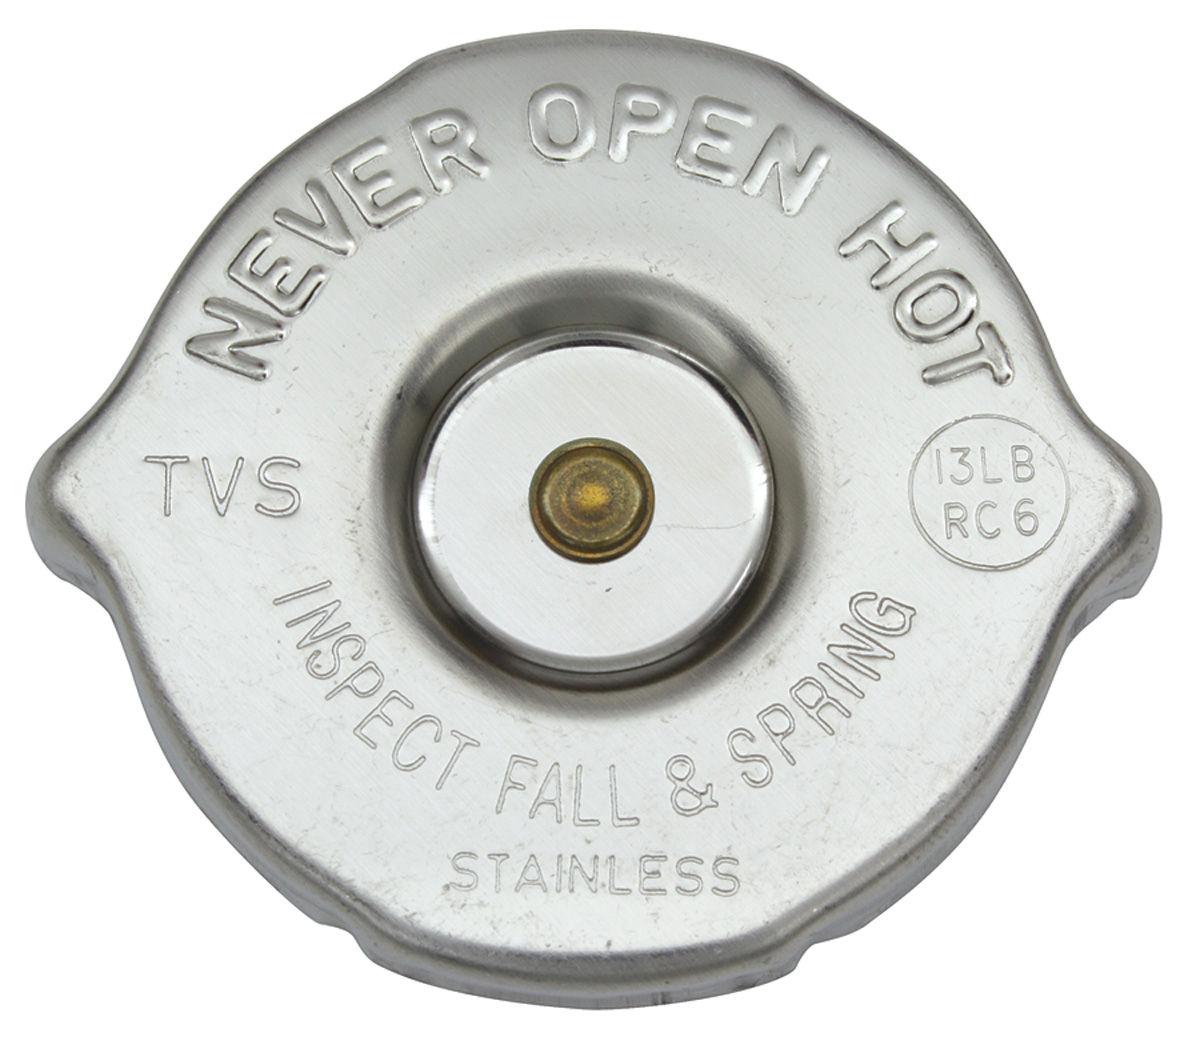 Radiator Cap, 54-69, RC6 13lb. Pressure